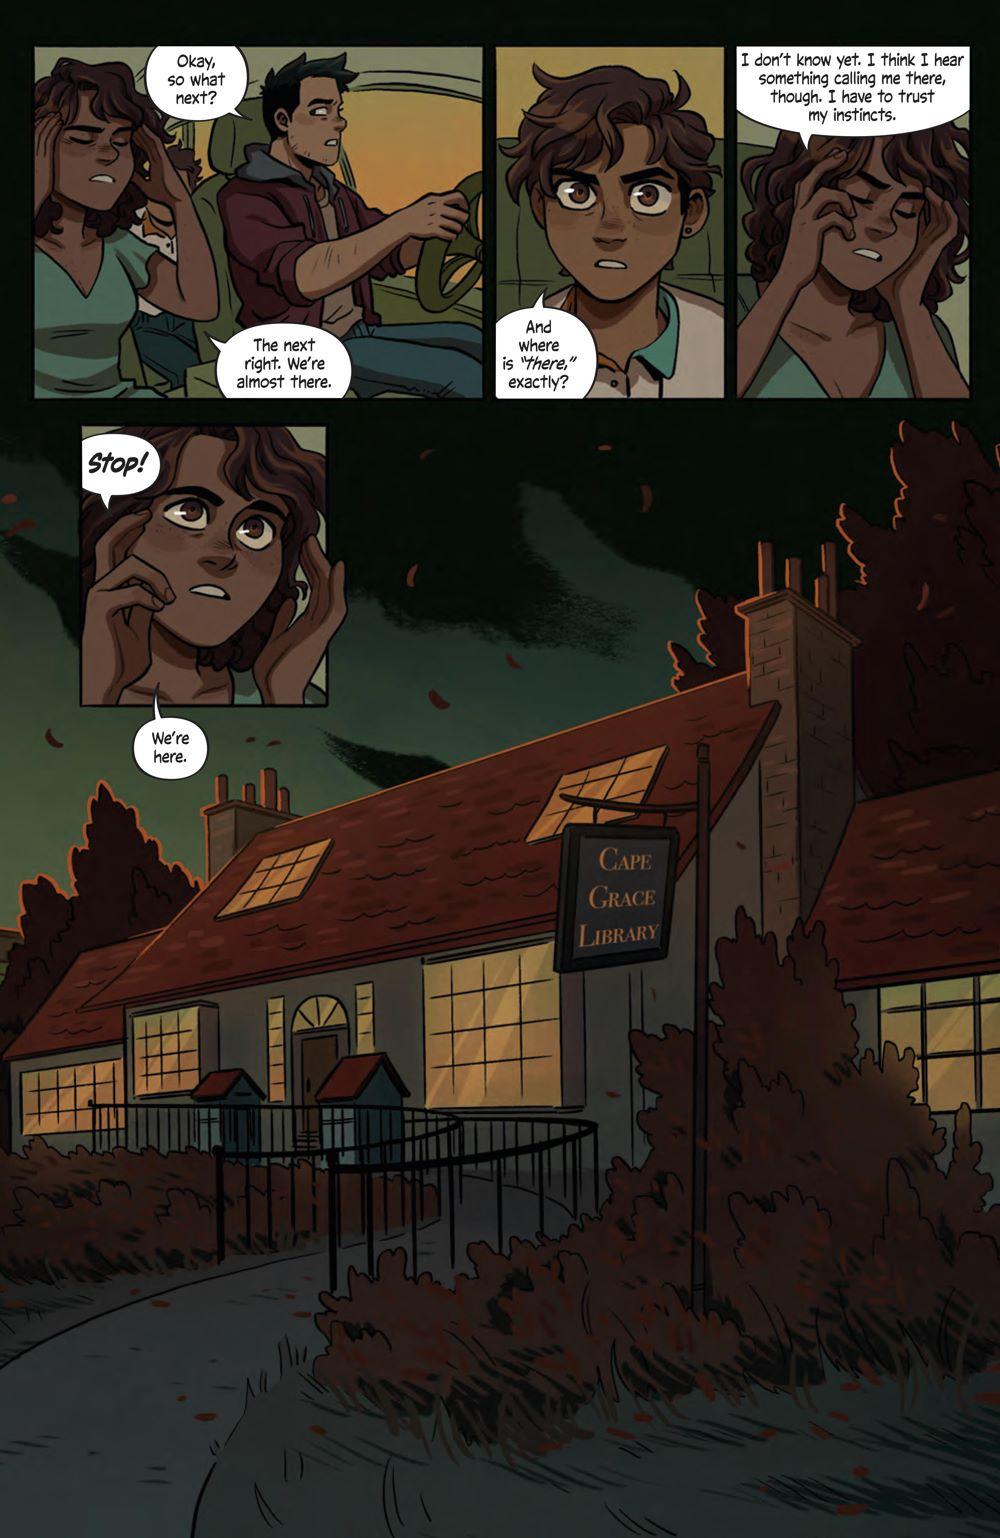 SpecterInspectors_002_PRESS_4 ComicList Previews: SPECTER INSPECTORS #2 (OF 5)